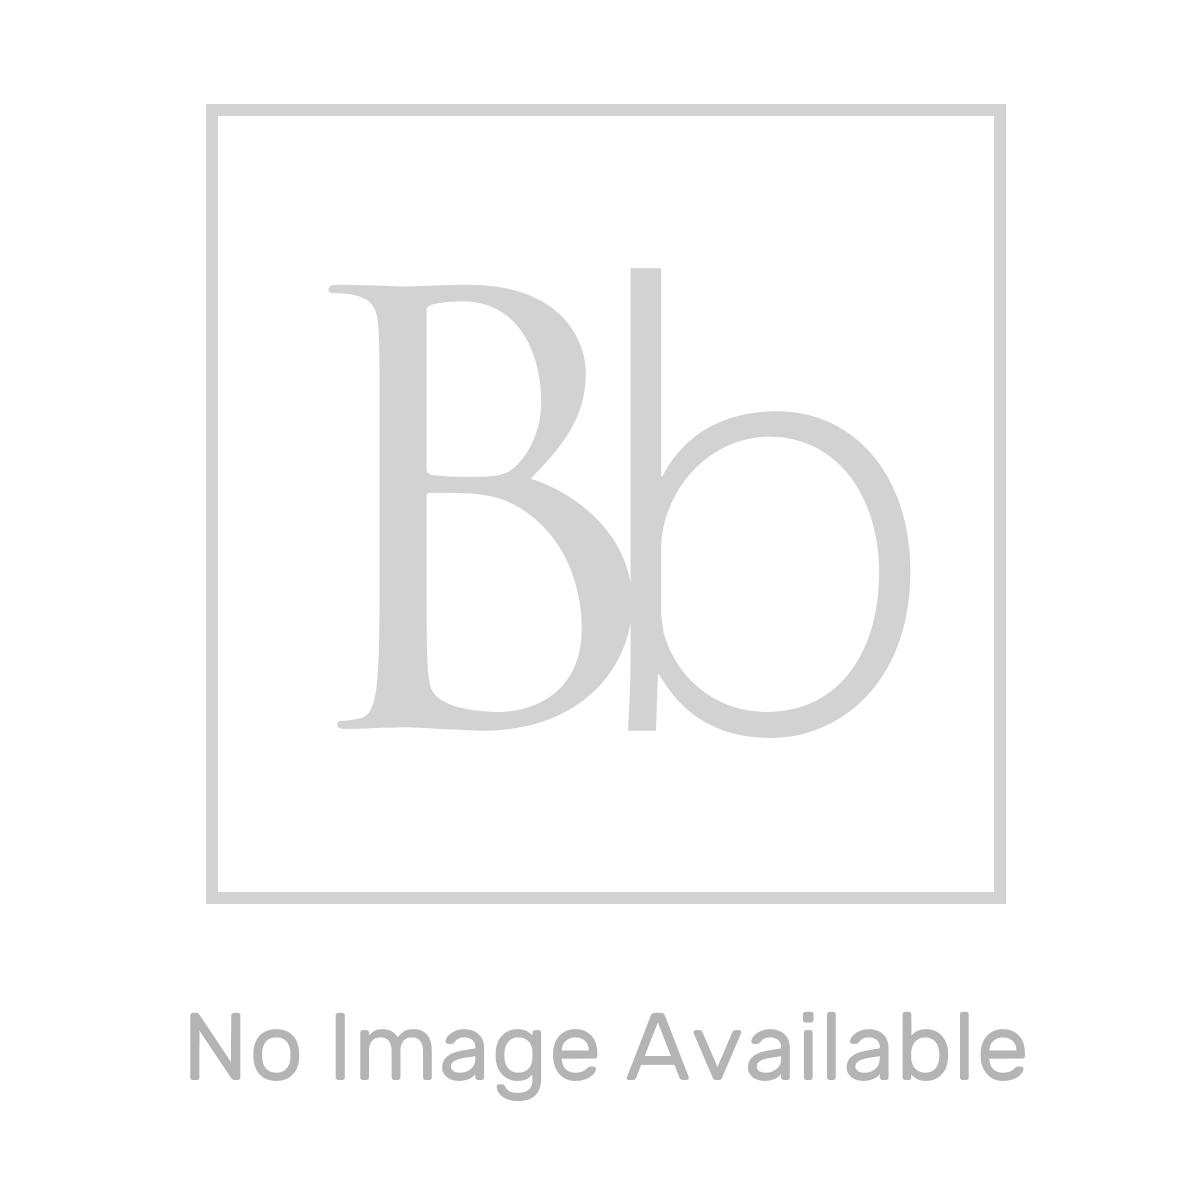 April Square Anti Slip Shower Tray 800 x 800 Line Drawing